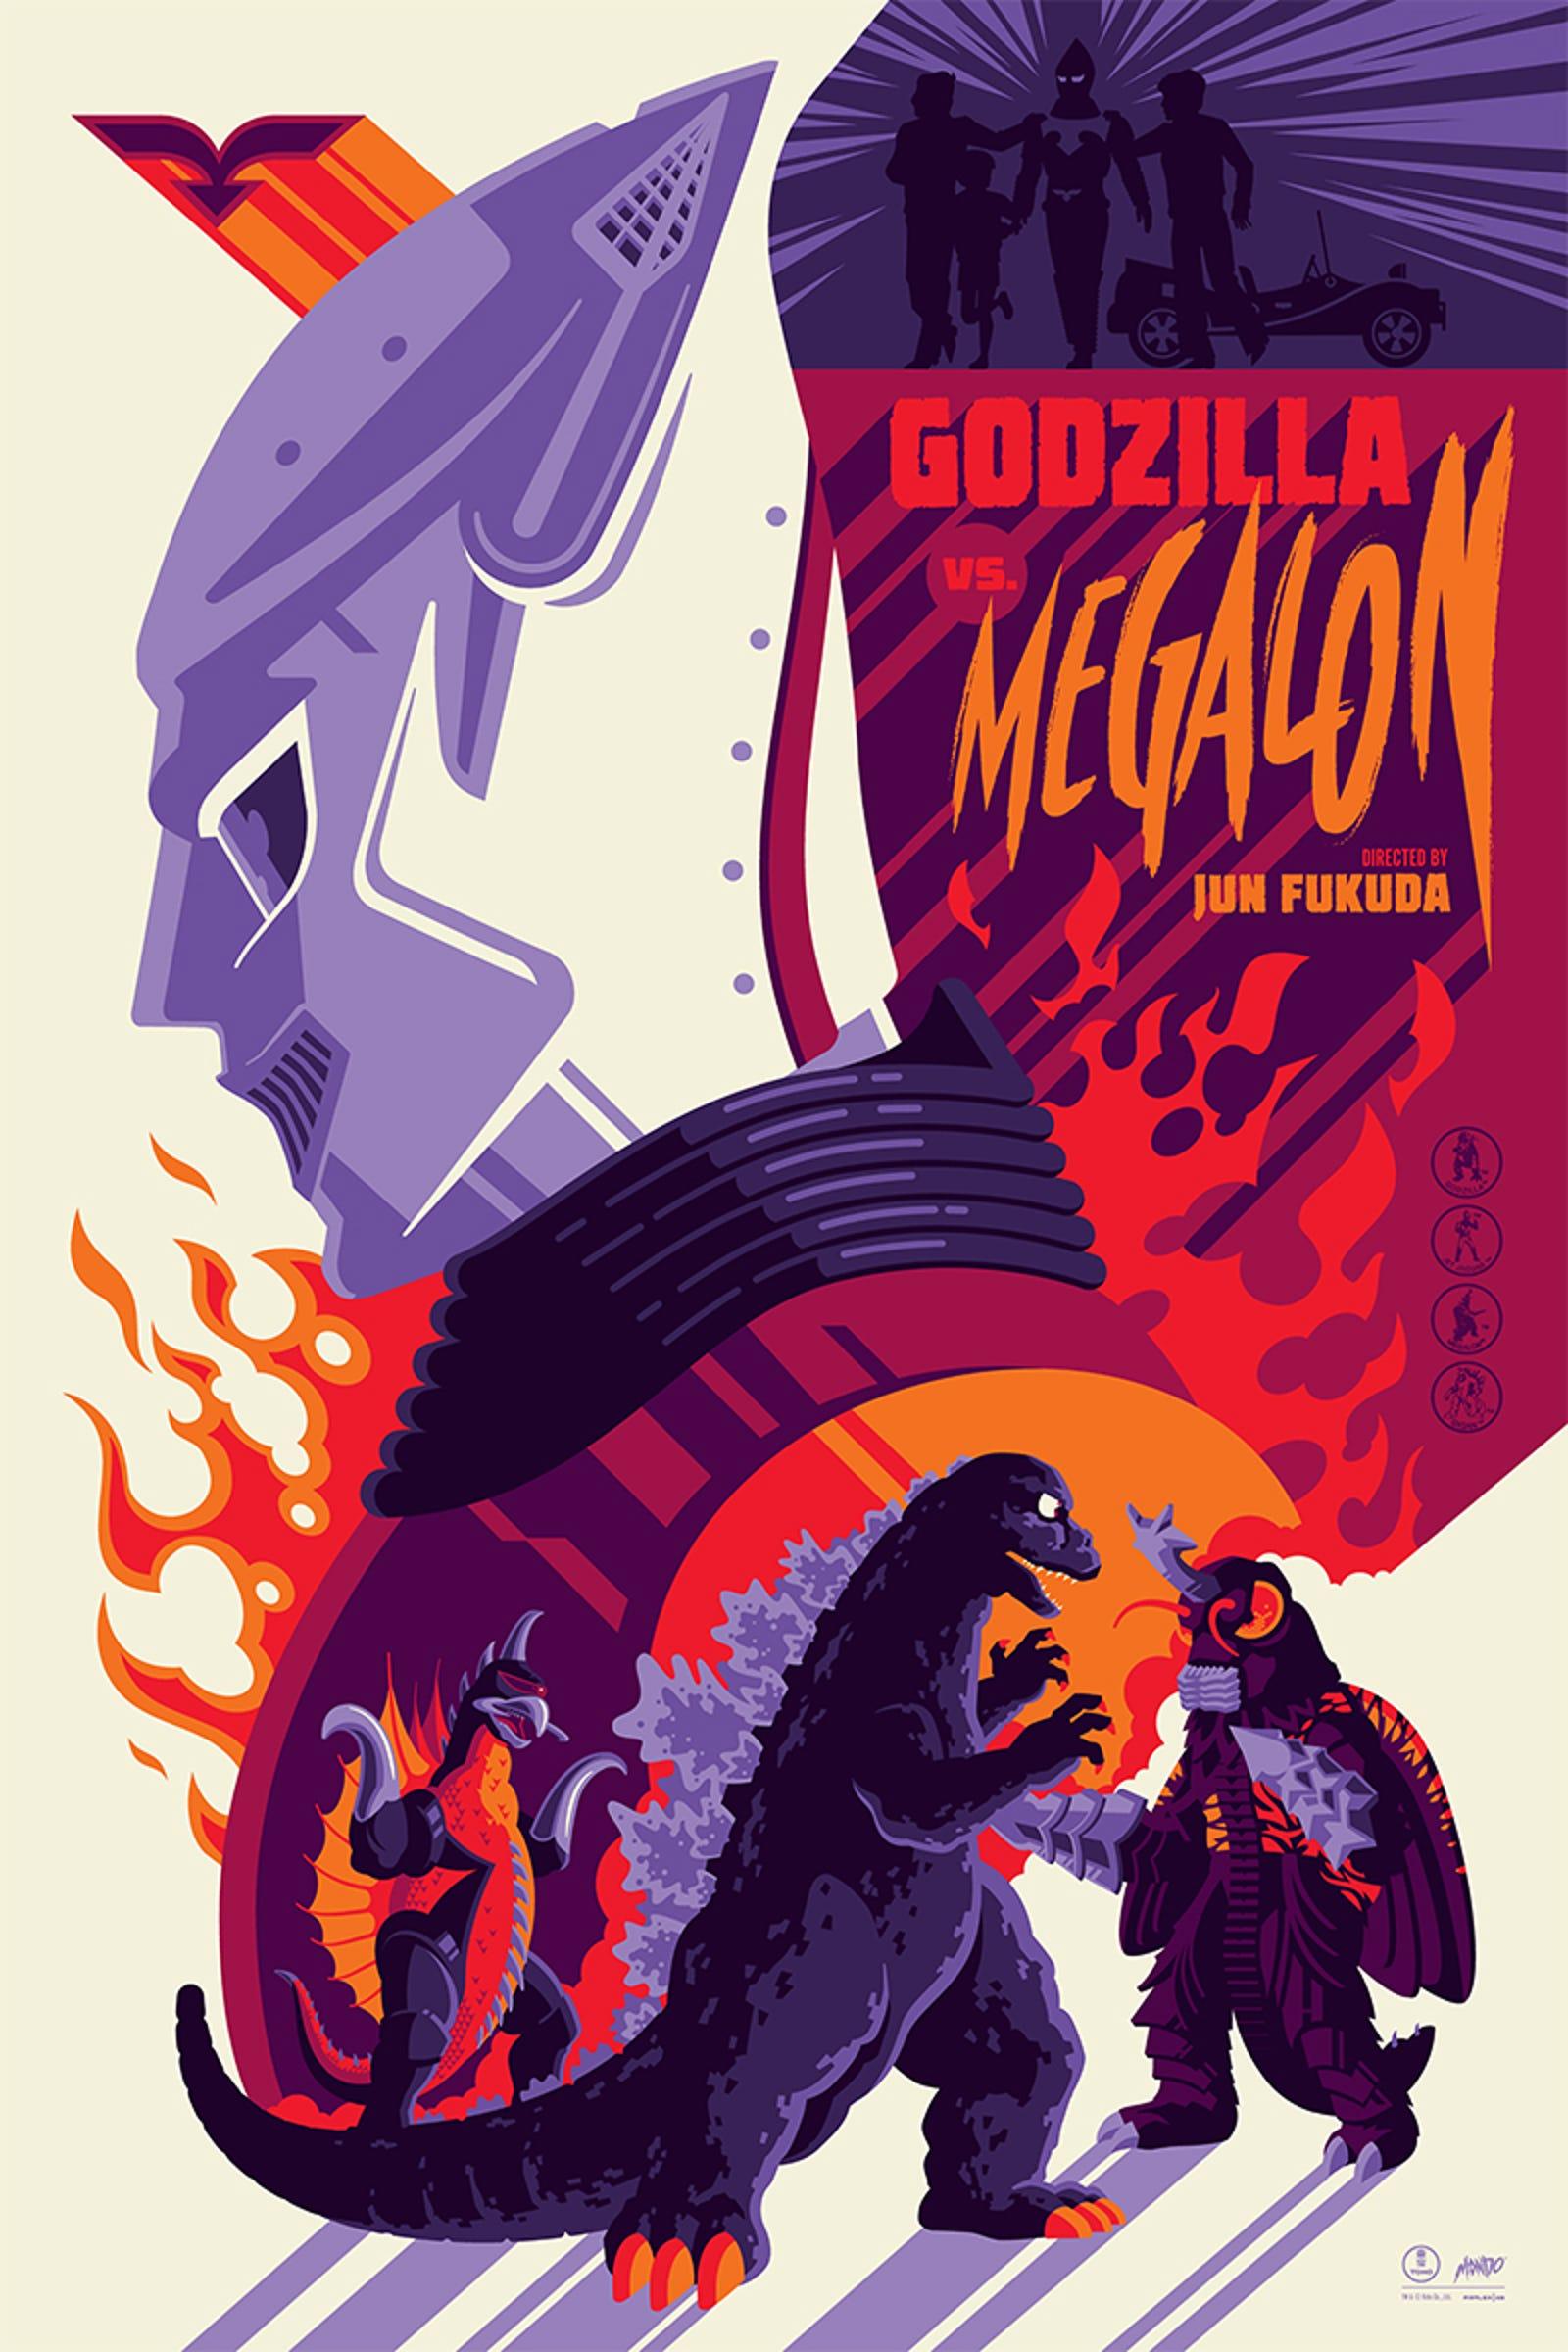 The standard edition of Godzilla vs. Megalon...